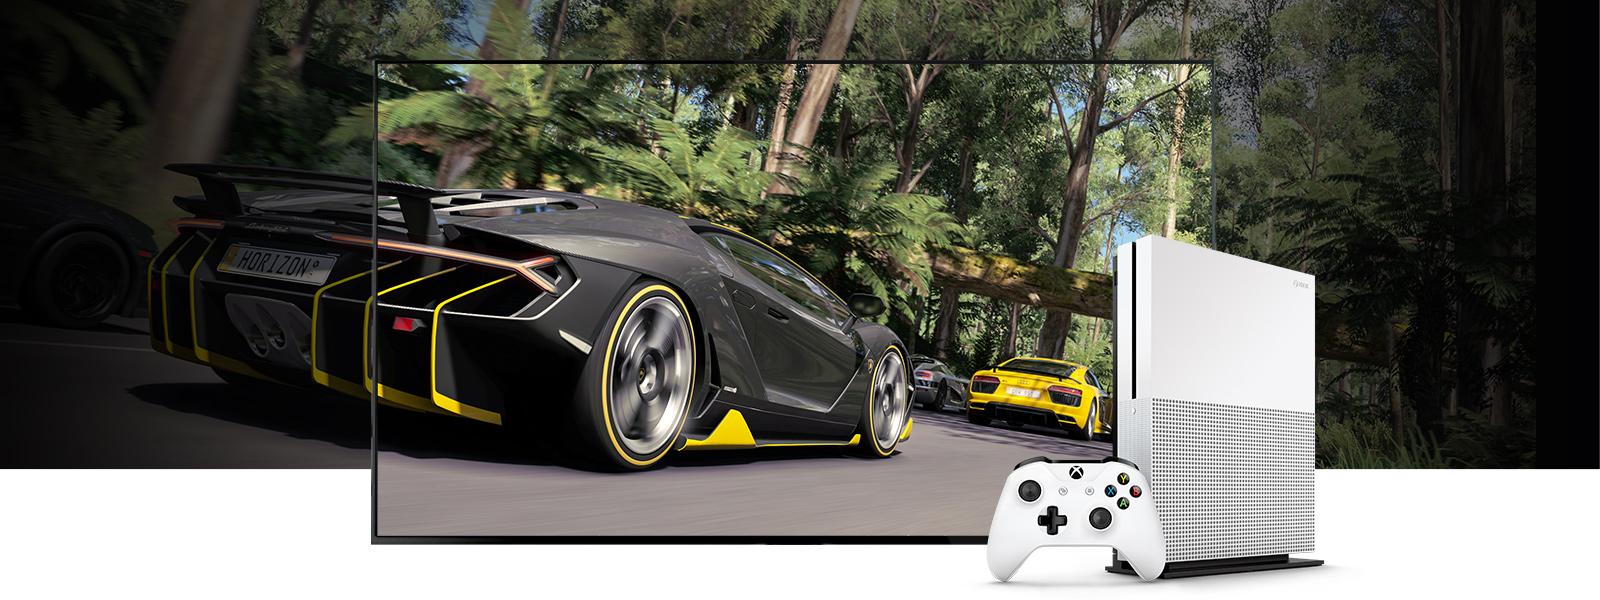 Forza Horizon 3 in High Dynamic Range on Xbox One S